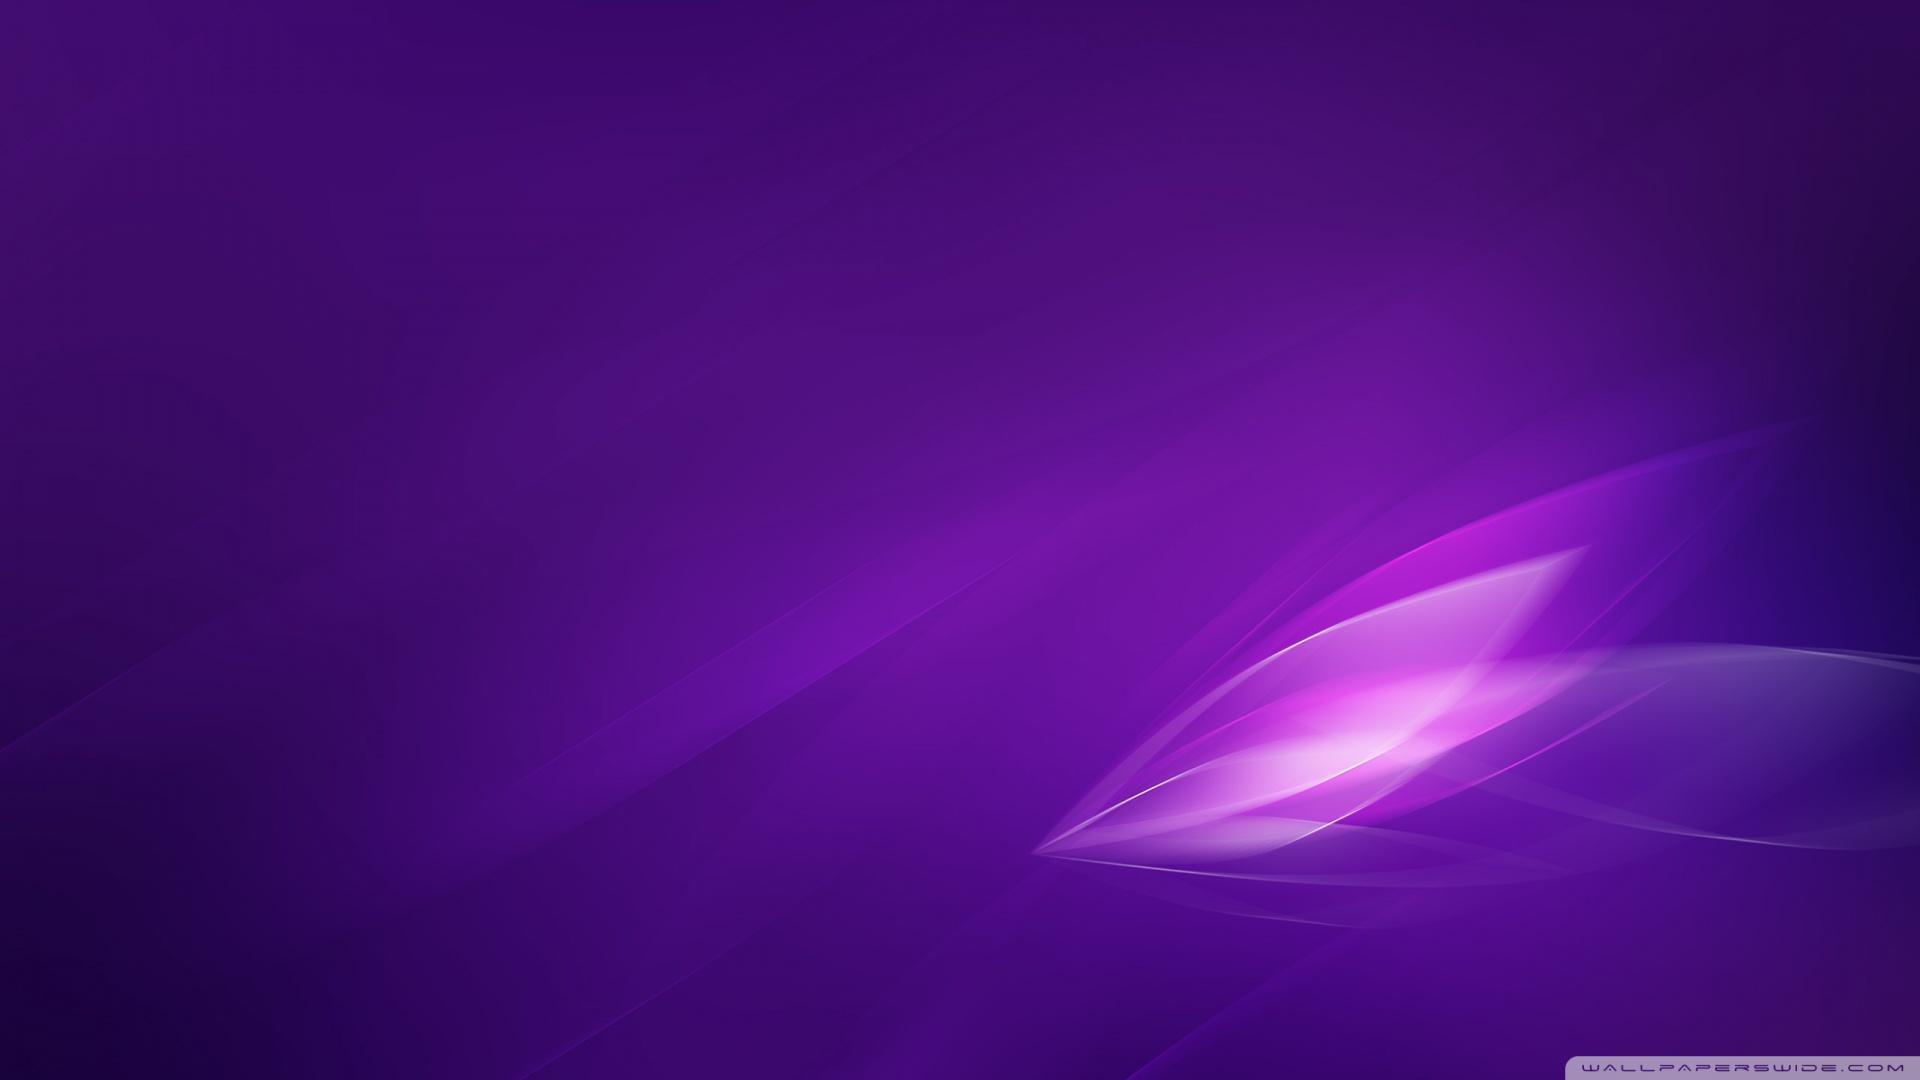 Purple Wallpaper   Colors Wallpaper 34511589 1920x1080